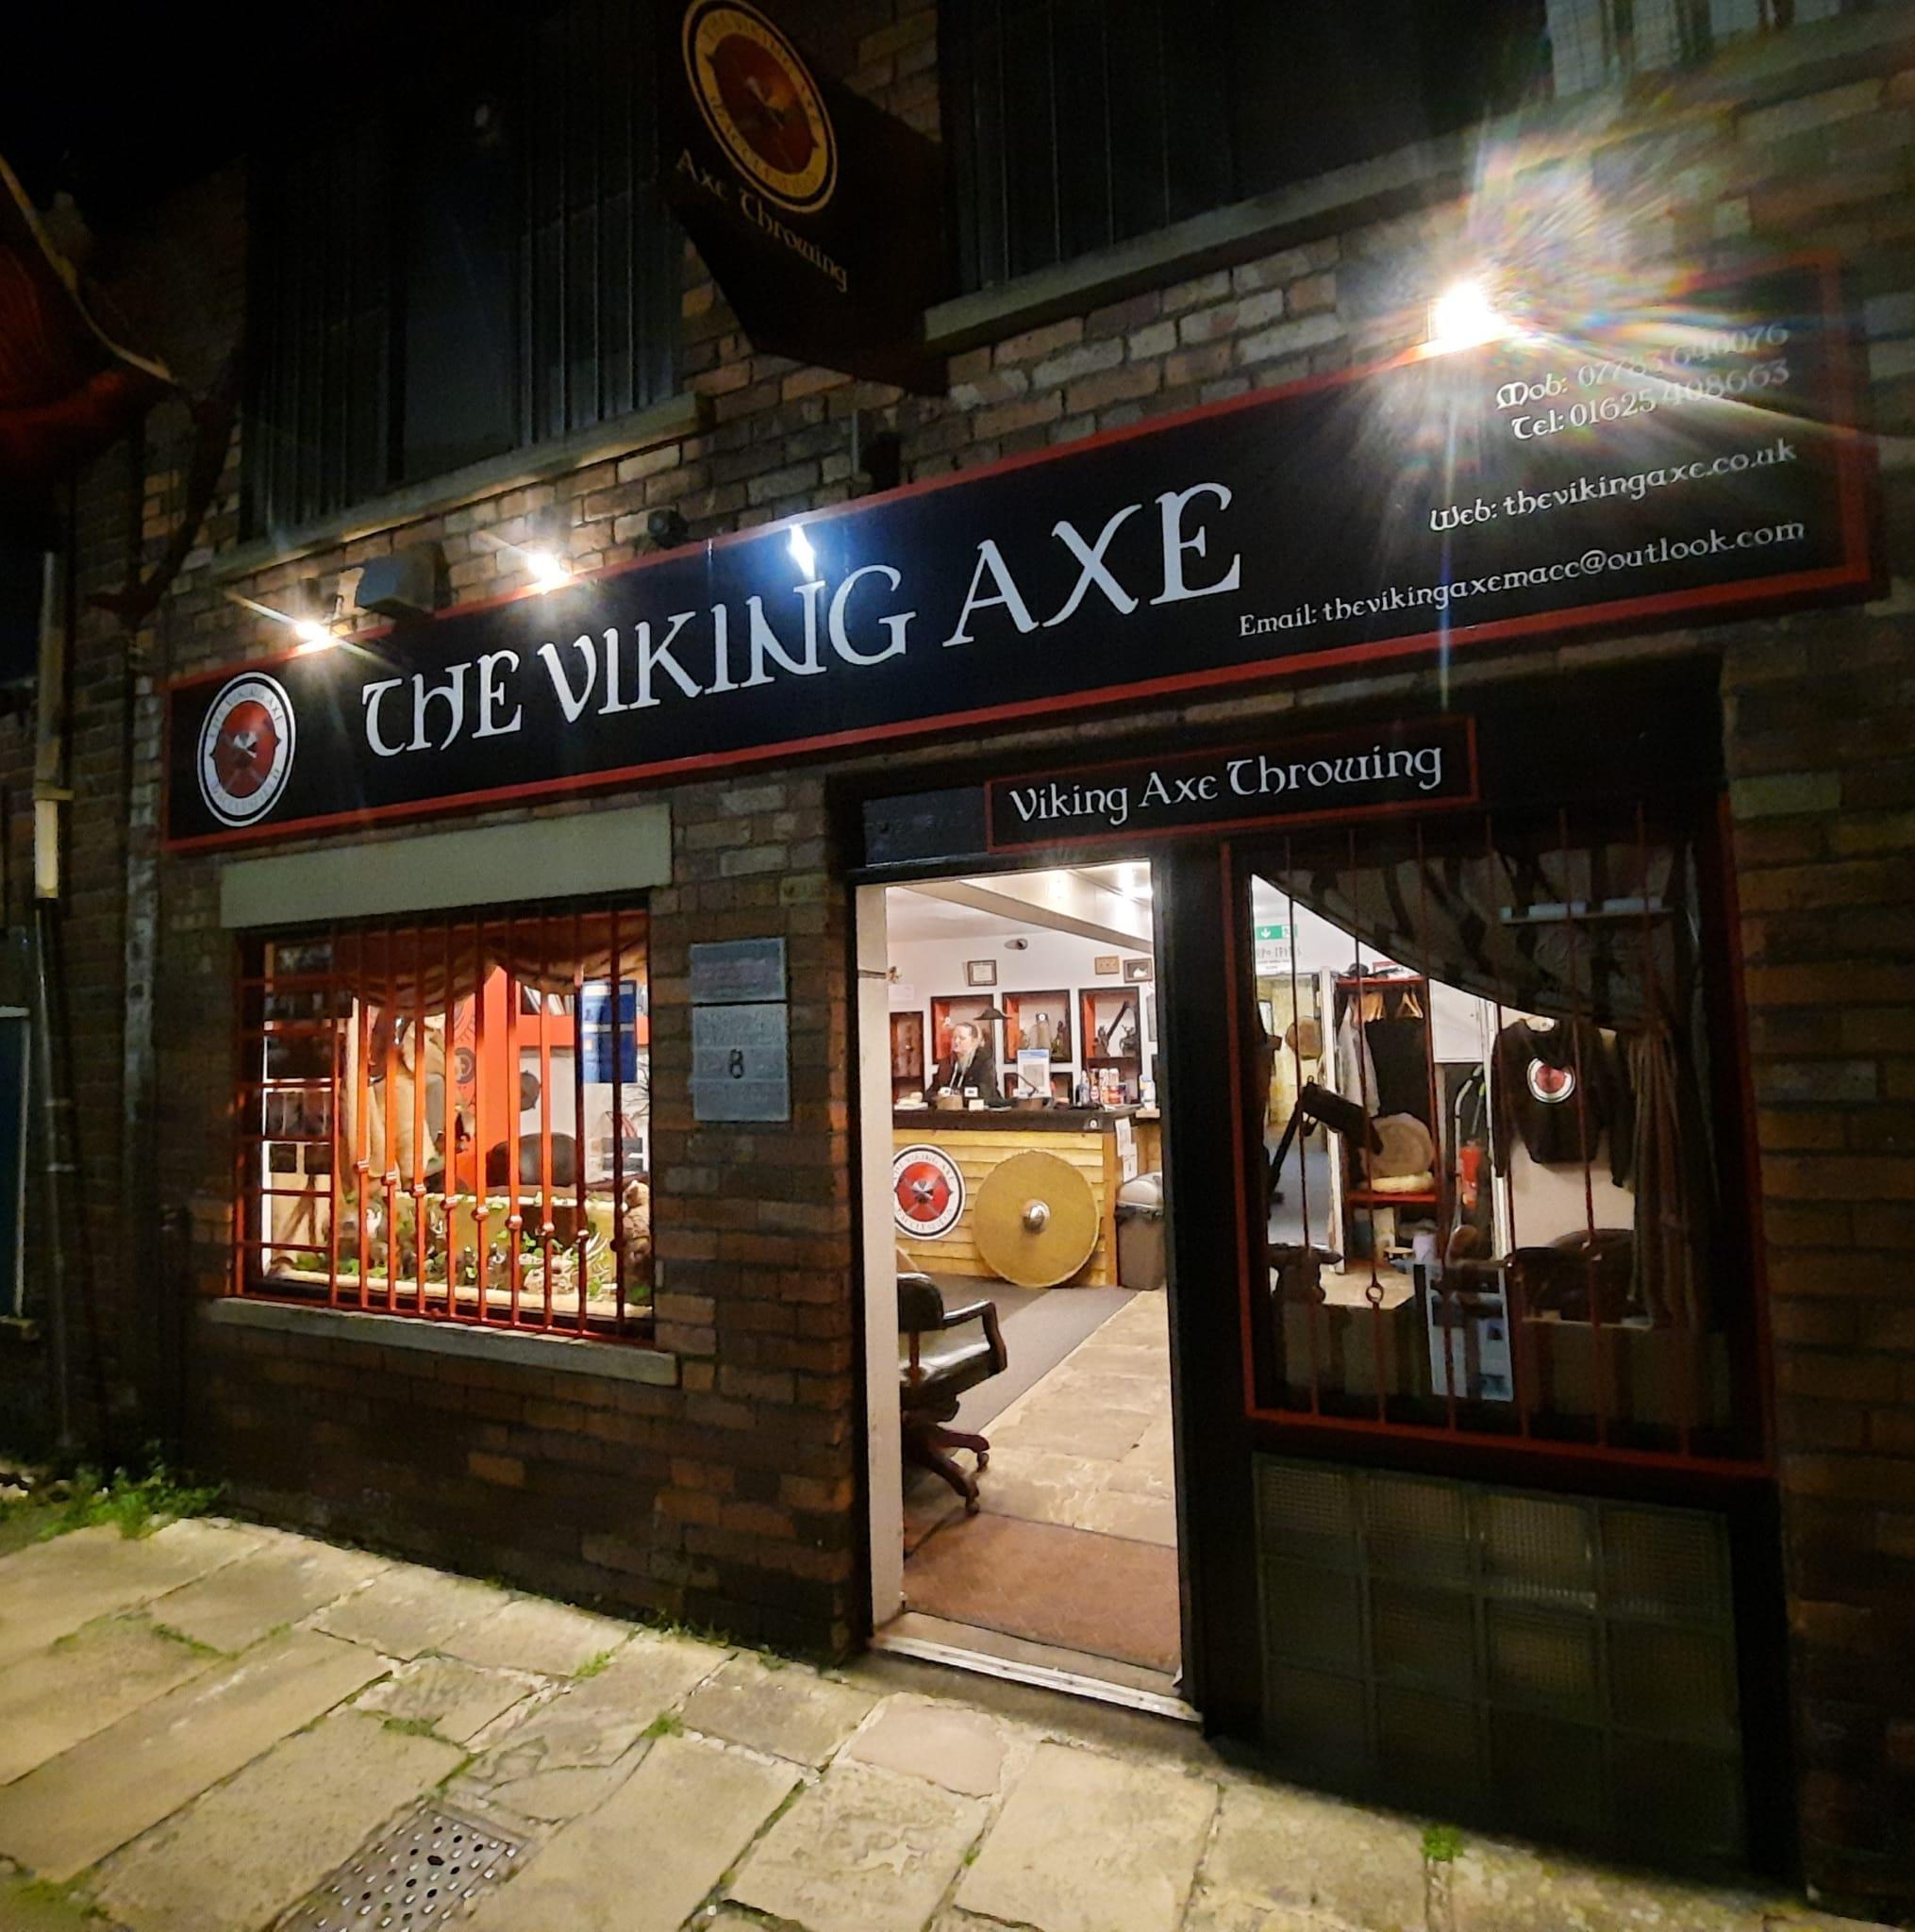 An image of The Viking Axe at night